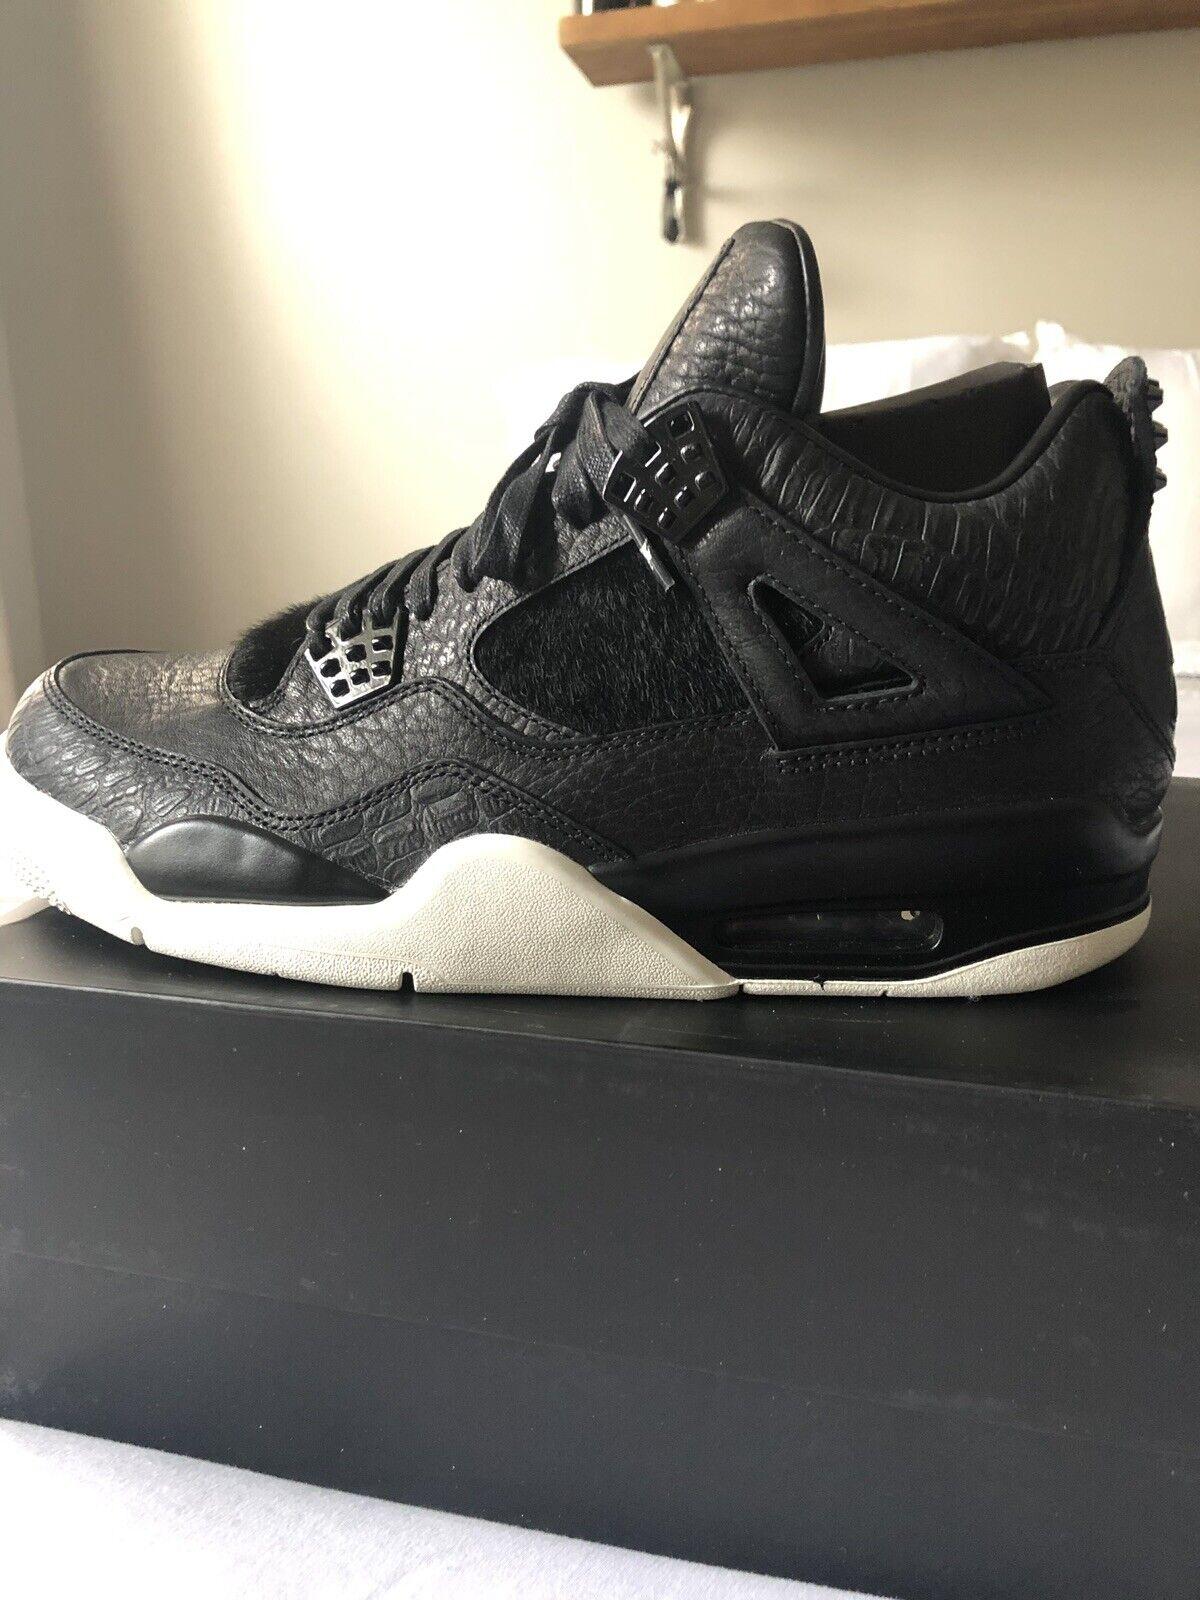 "cheap for discount 47fd7 4ce44 Nike Air Jordan Jordan Jordan 4 - ""premium Black Pony Hair"" Size 10.5 ."